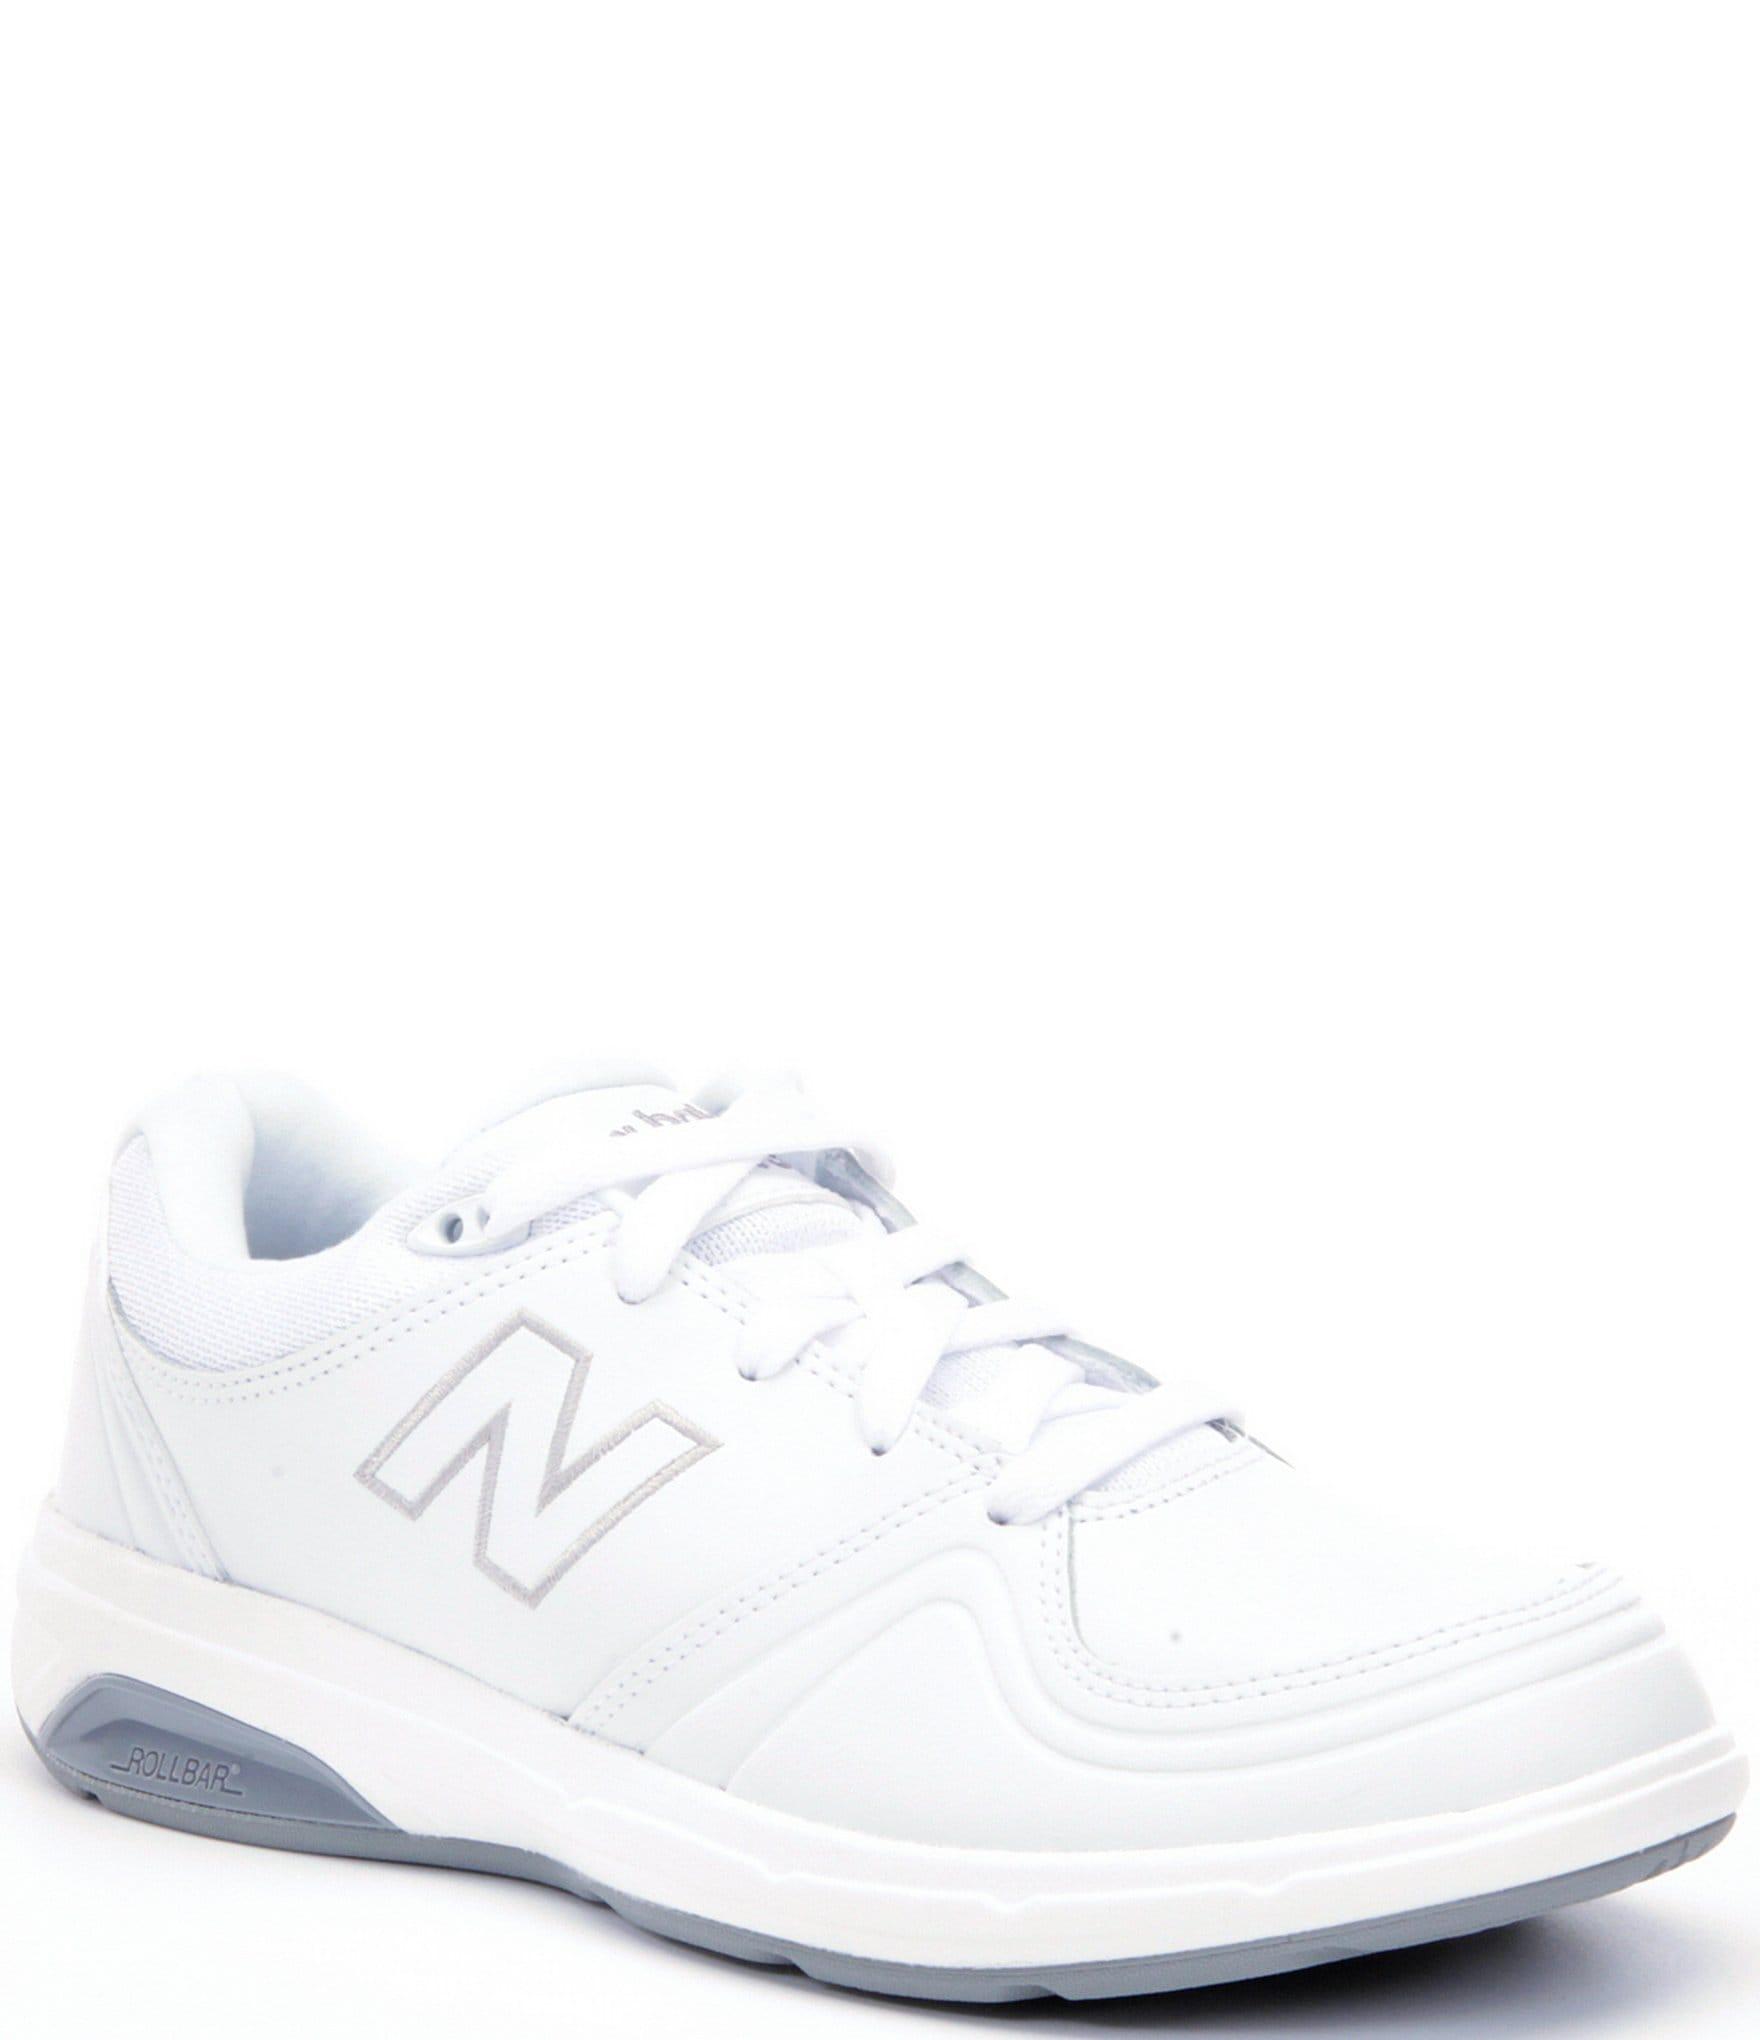 New Balance 813 Walking Shoes | Dillard's